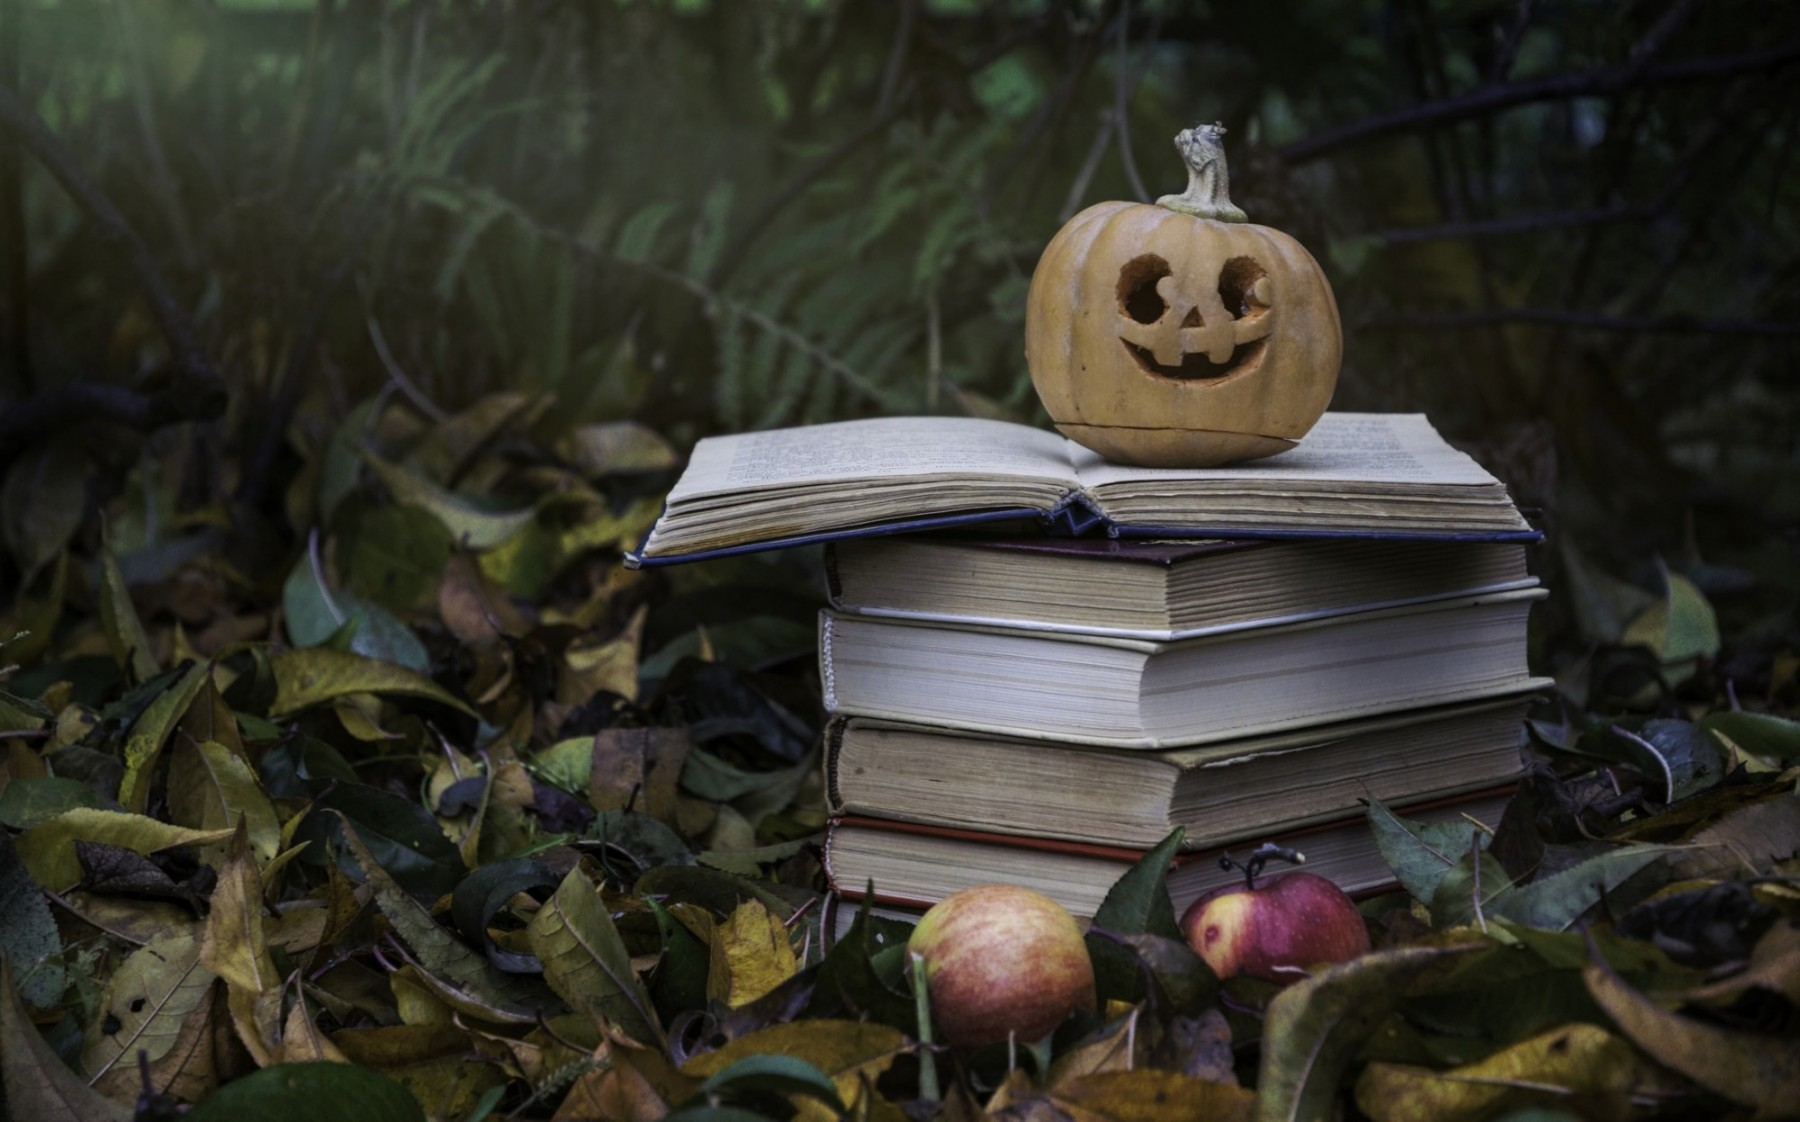 Spooky pumpkin on pile of books